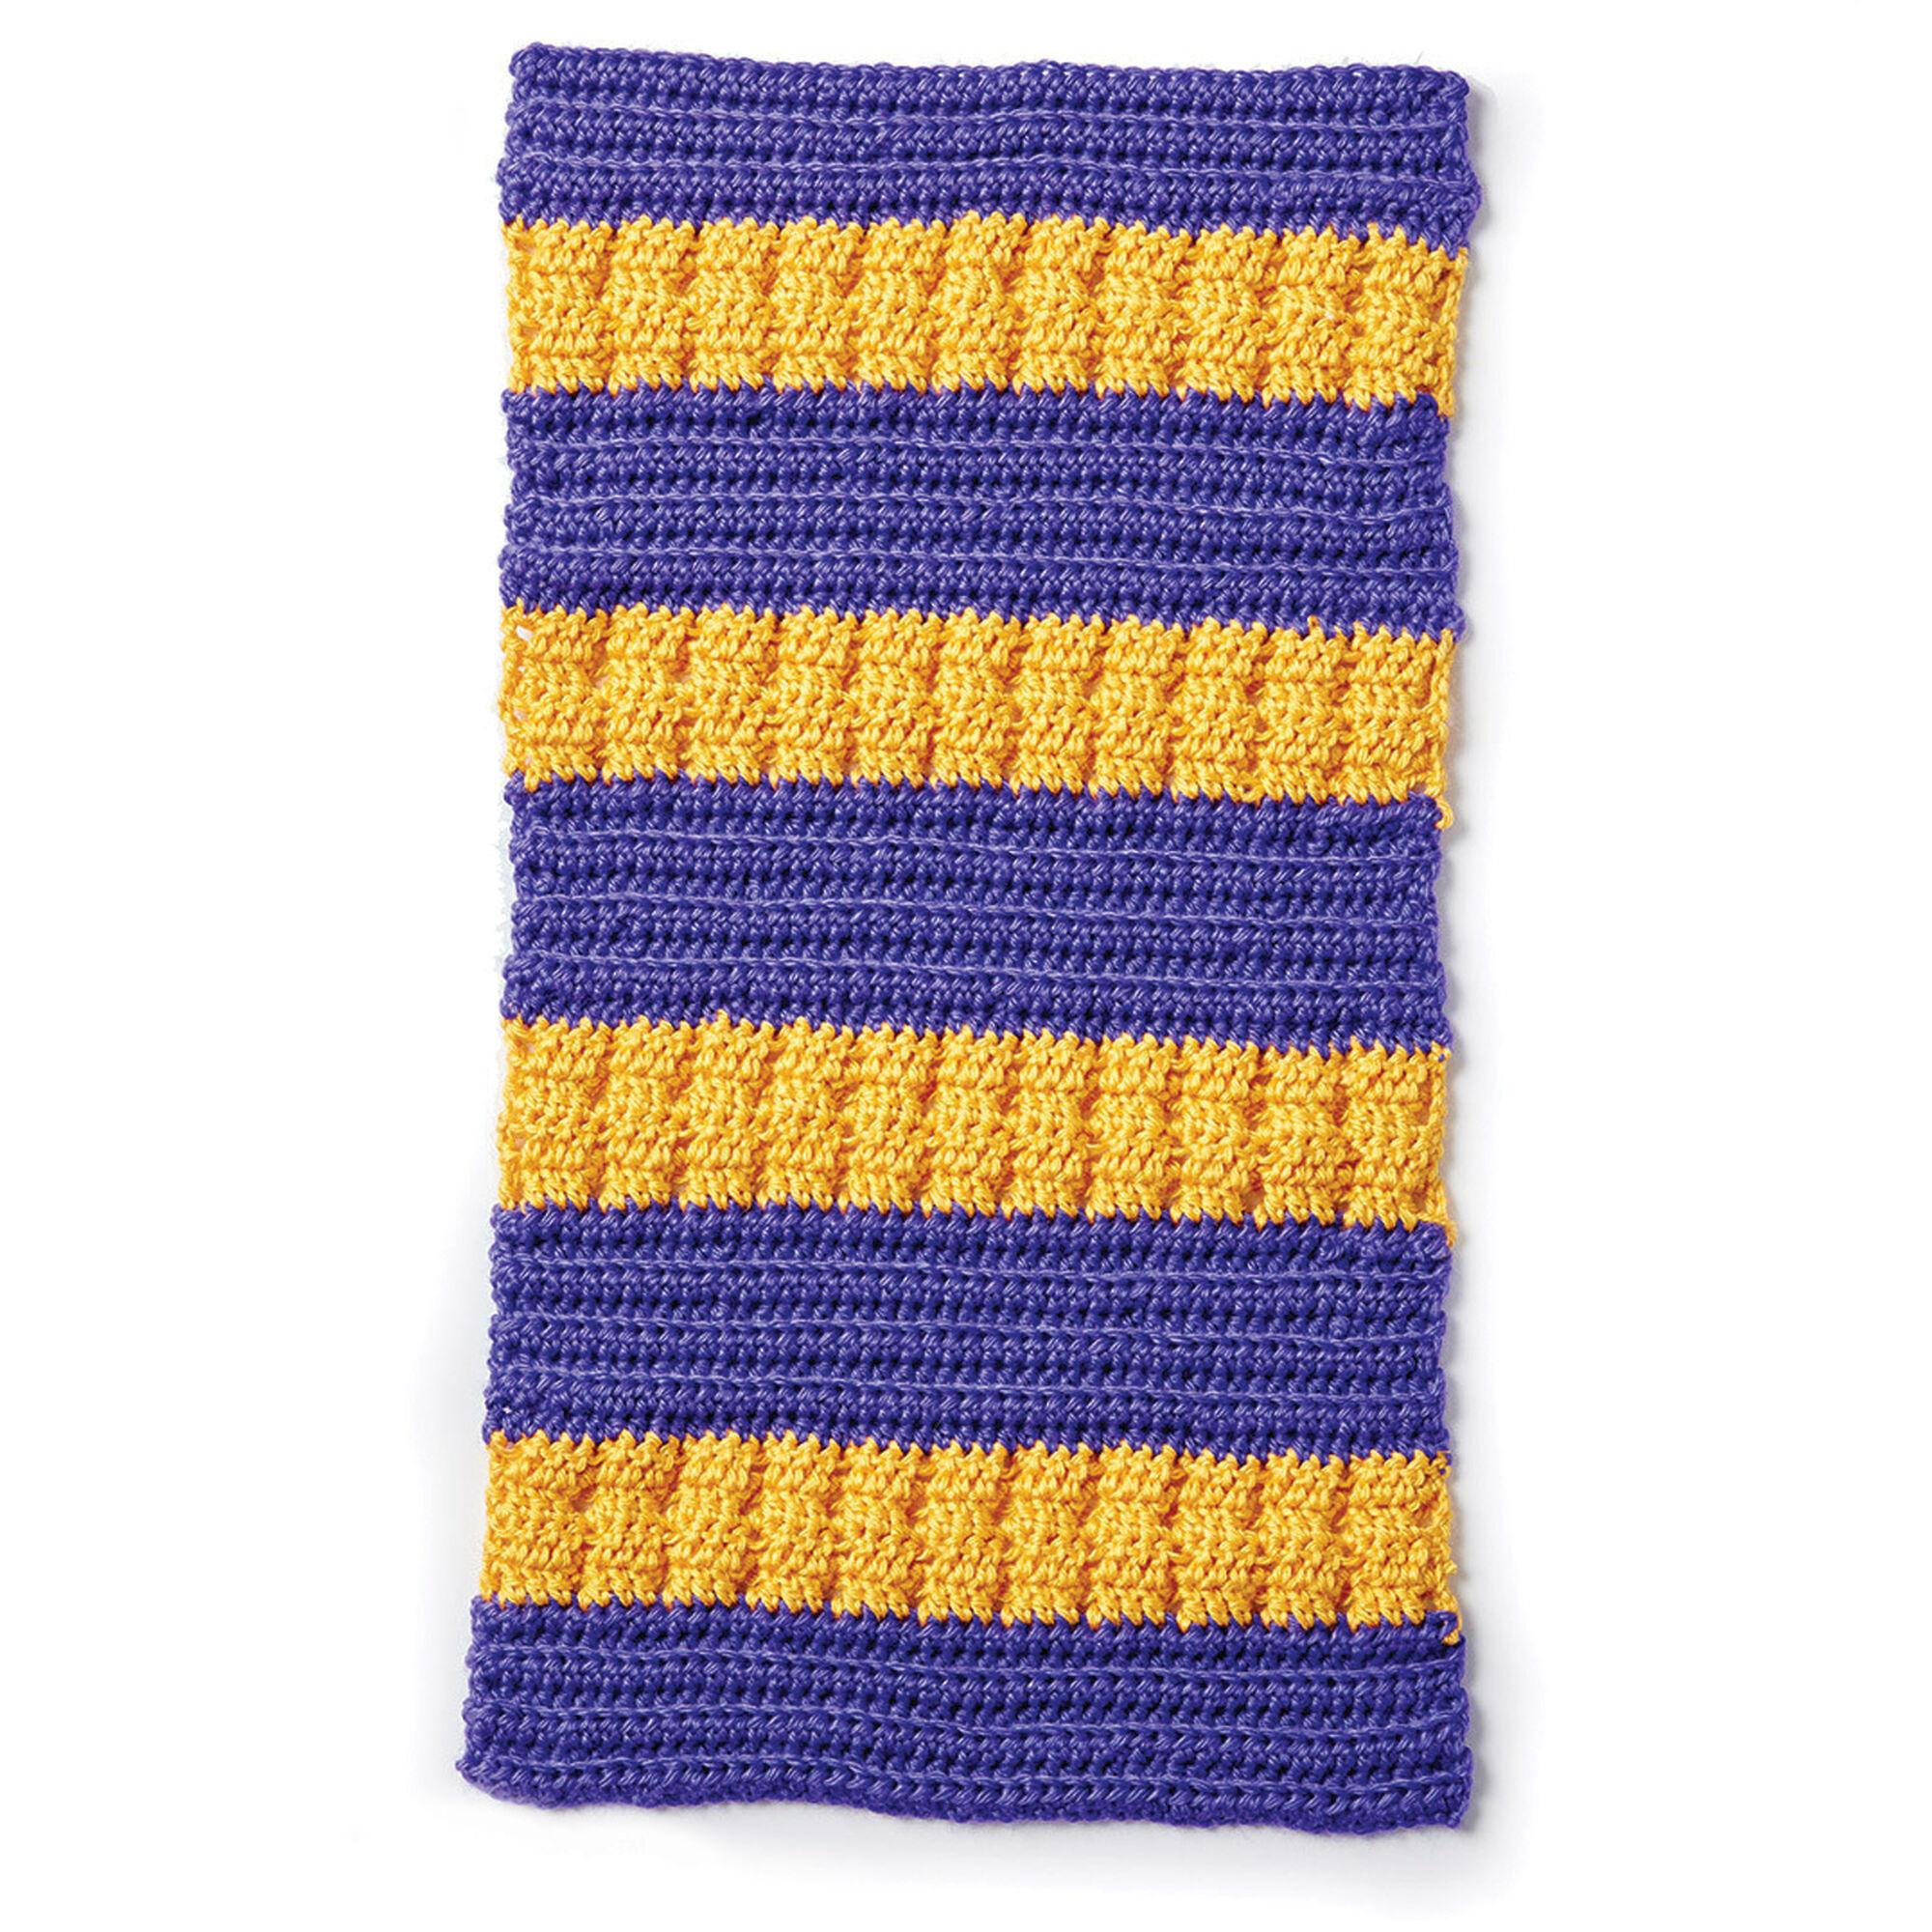 Caron School Colors Crochet Afghan Version 4 Yarnspirations